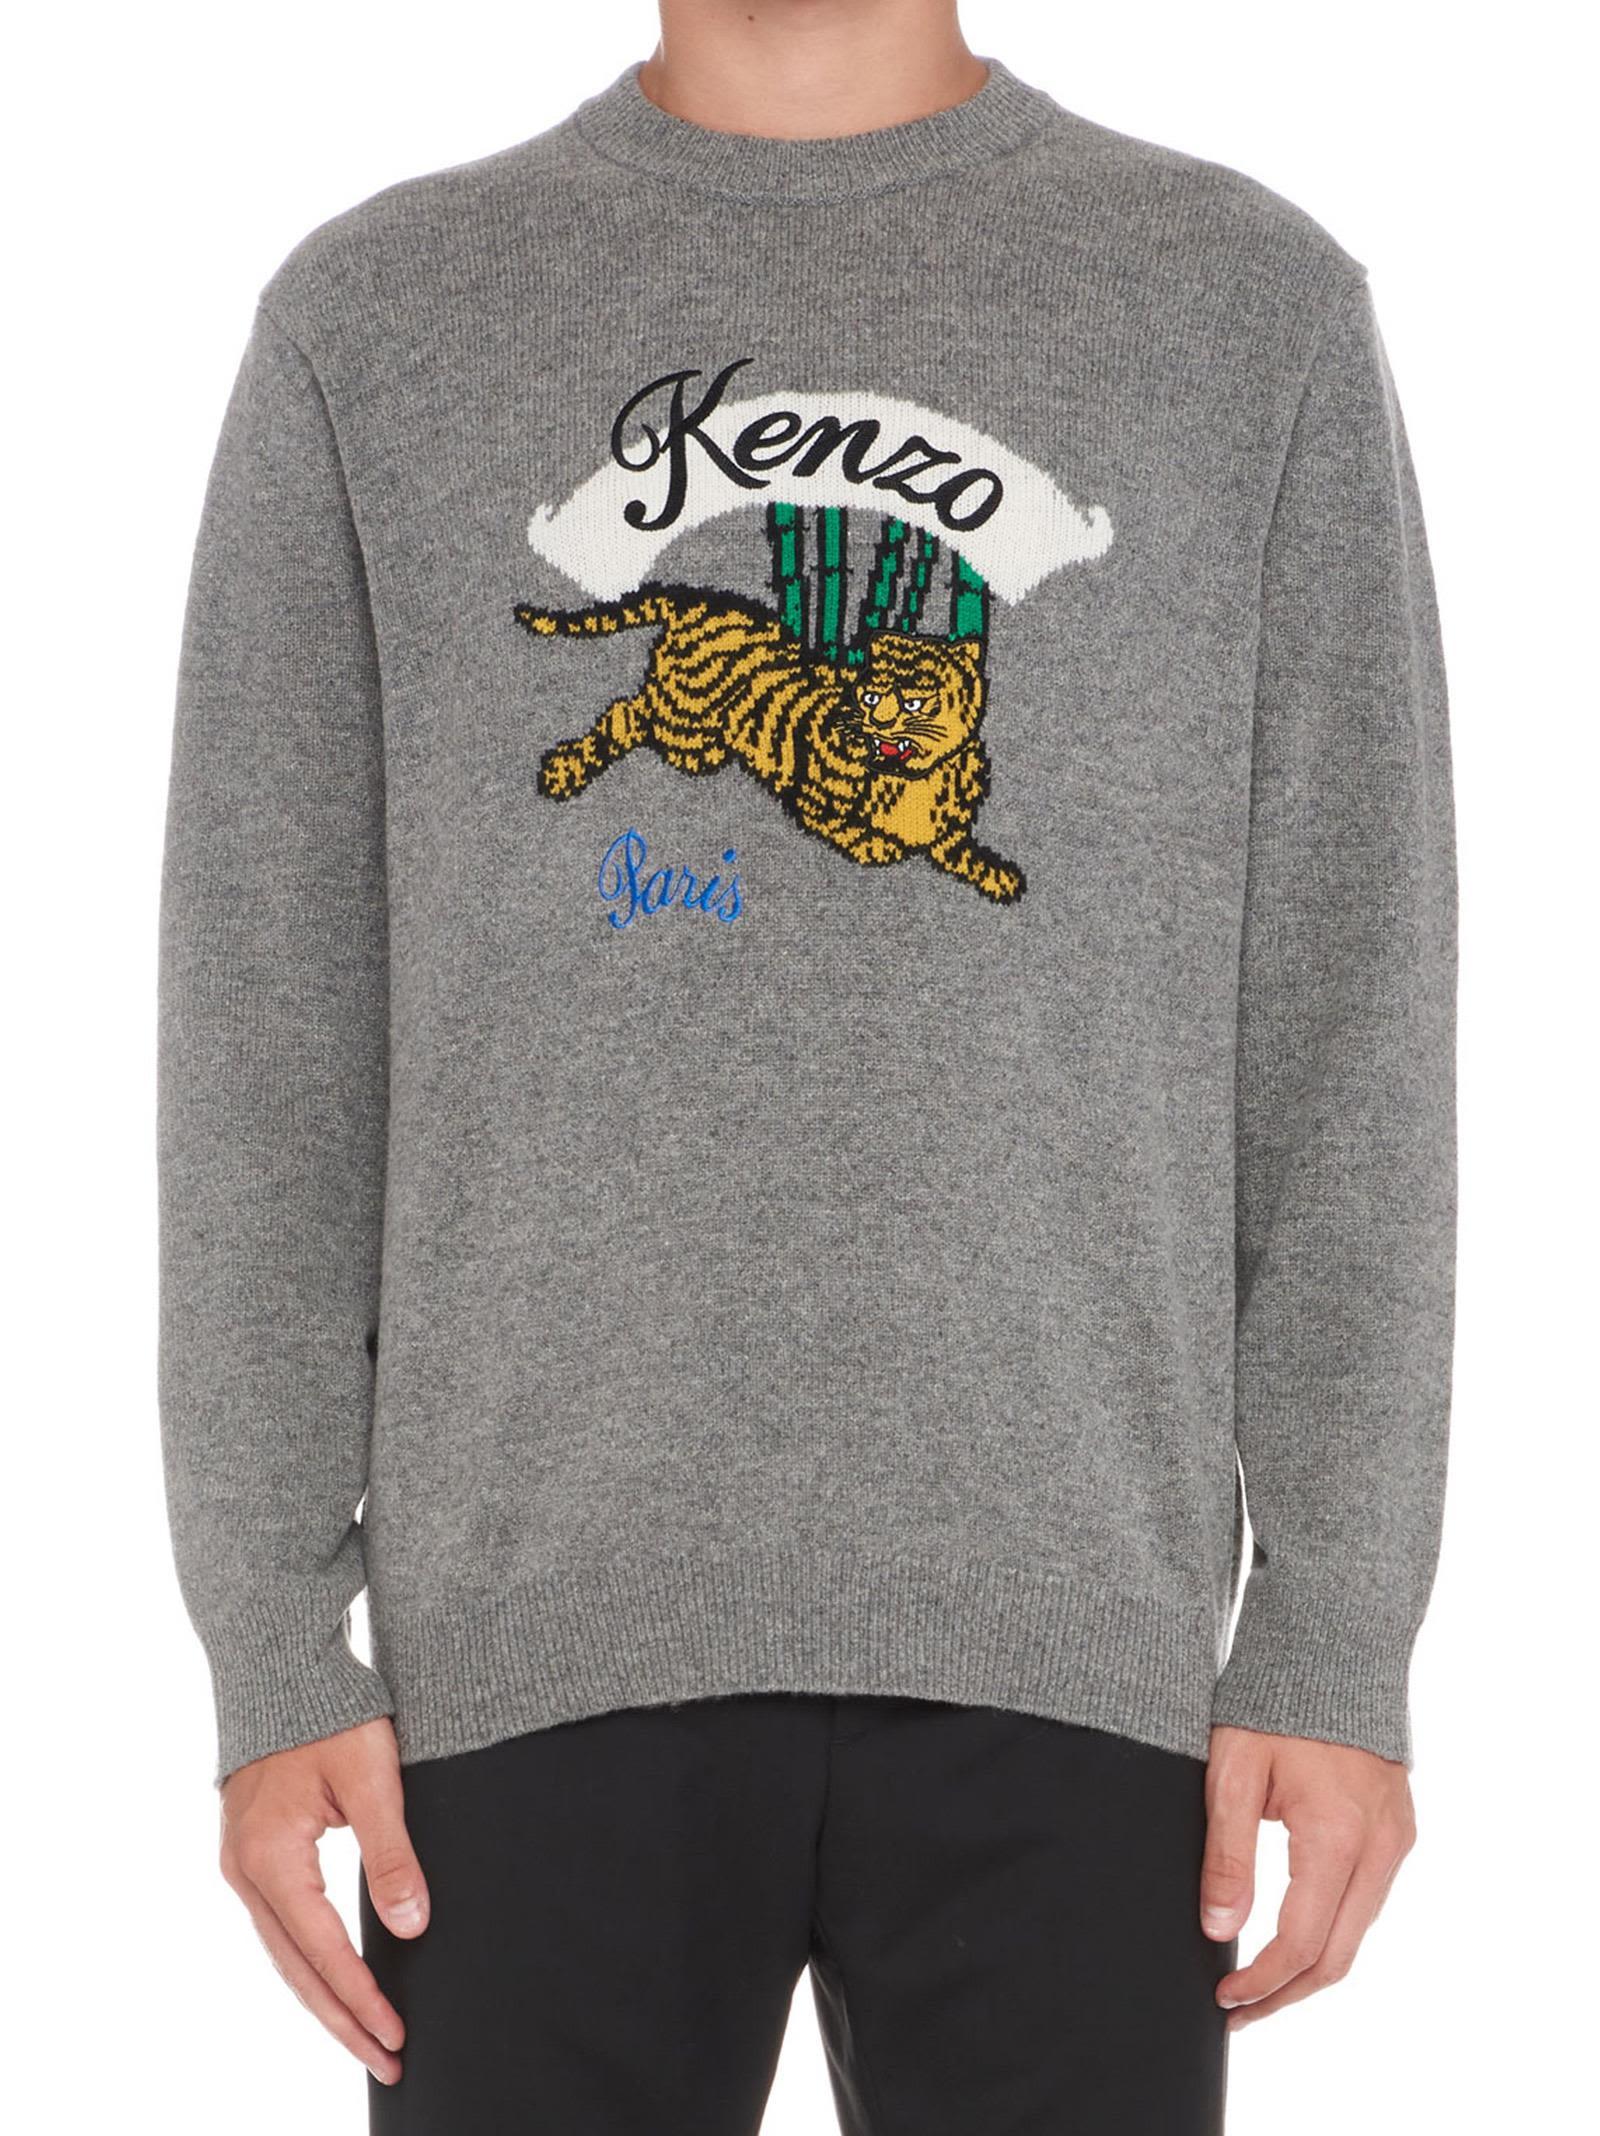 Kenzo 'jumping Tiger' Sweater